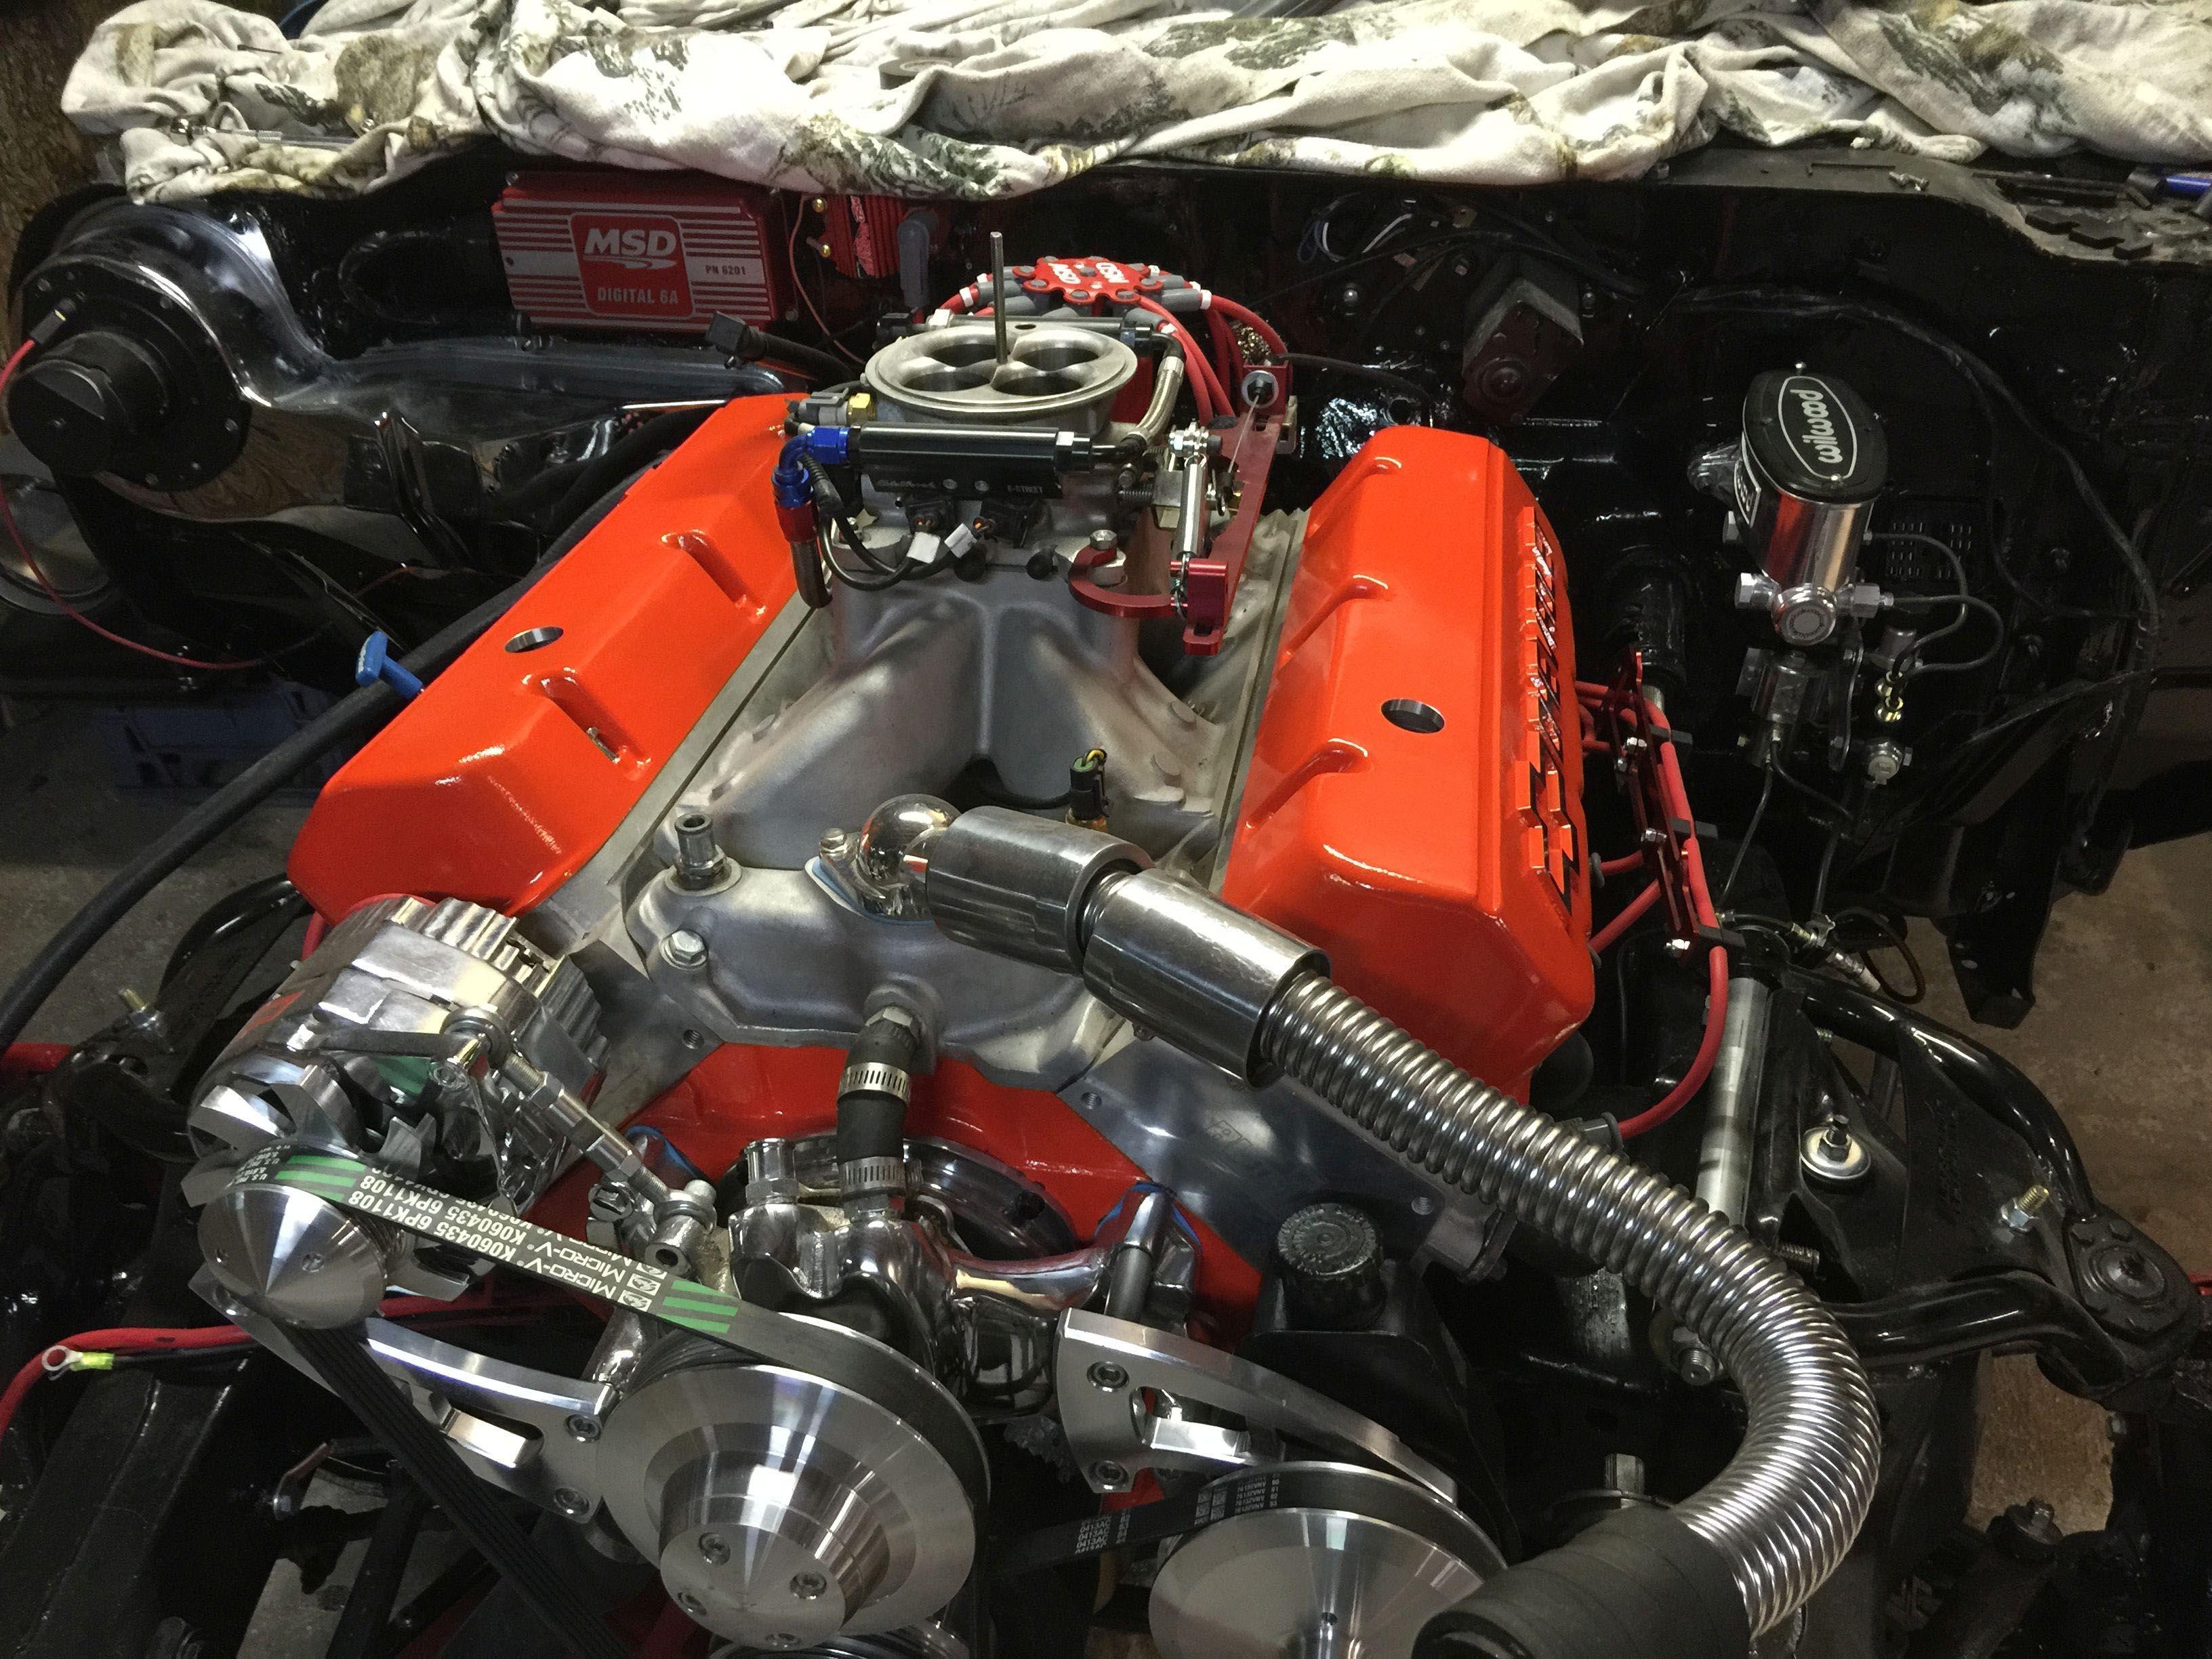 Httpblueprintenginesindexpproductsbp gm crate blueprint engines builds ford crate engines and chevy crate engines these crate engines are high performance drop in engines sometimes called stroker malvernweather Gallery